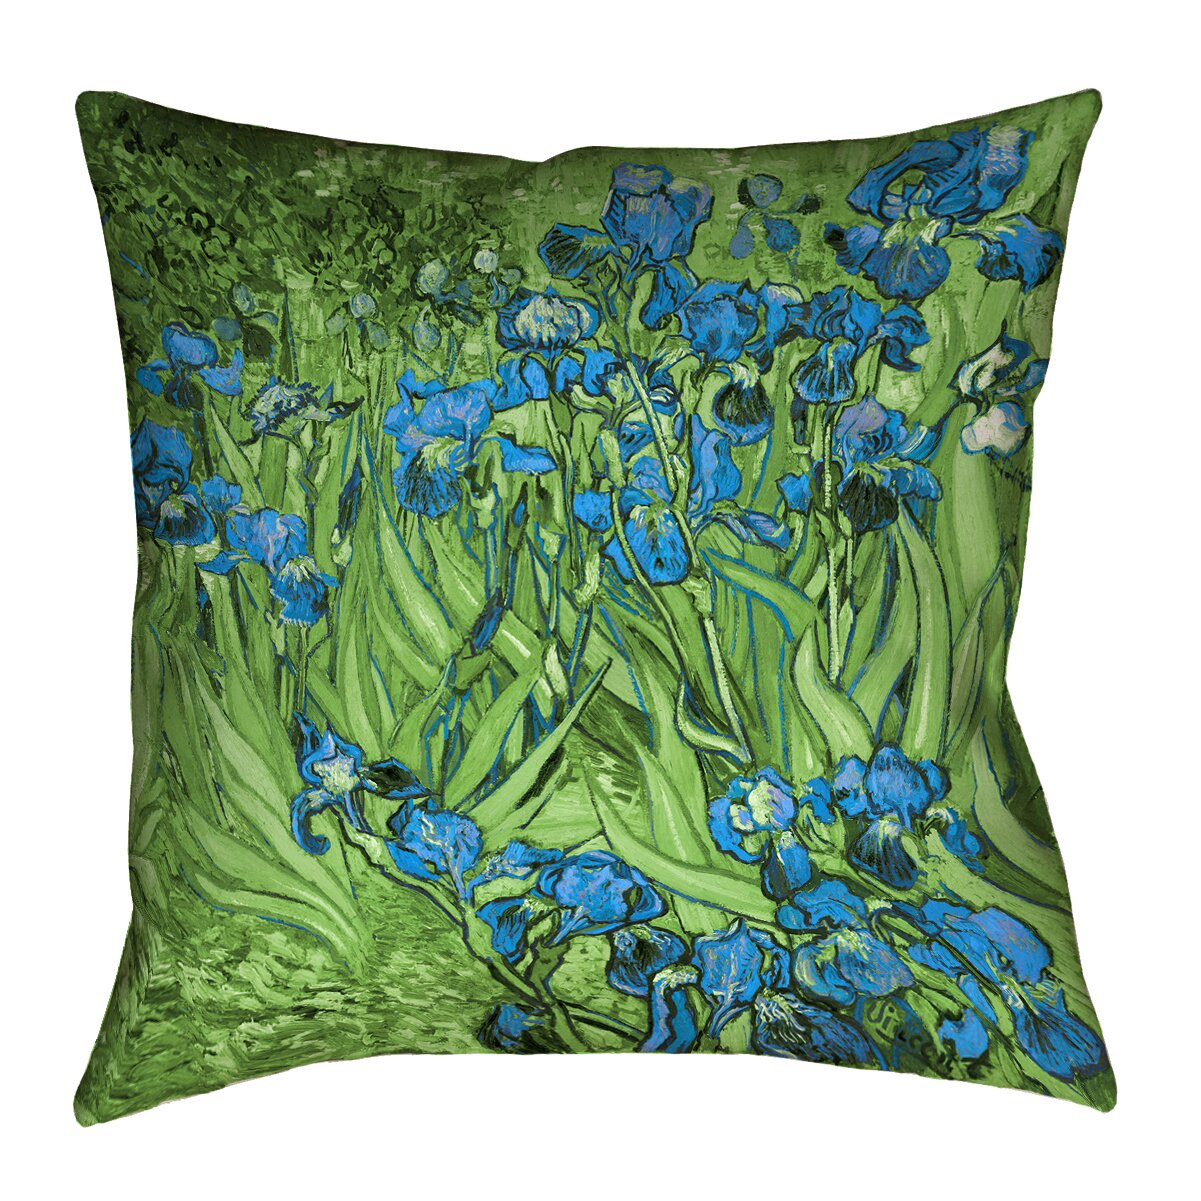 ArtVerse Vincent Van Gogh Irises in Green and Blue Outdoor Throw Pillow Wayfair.ca